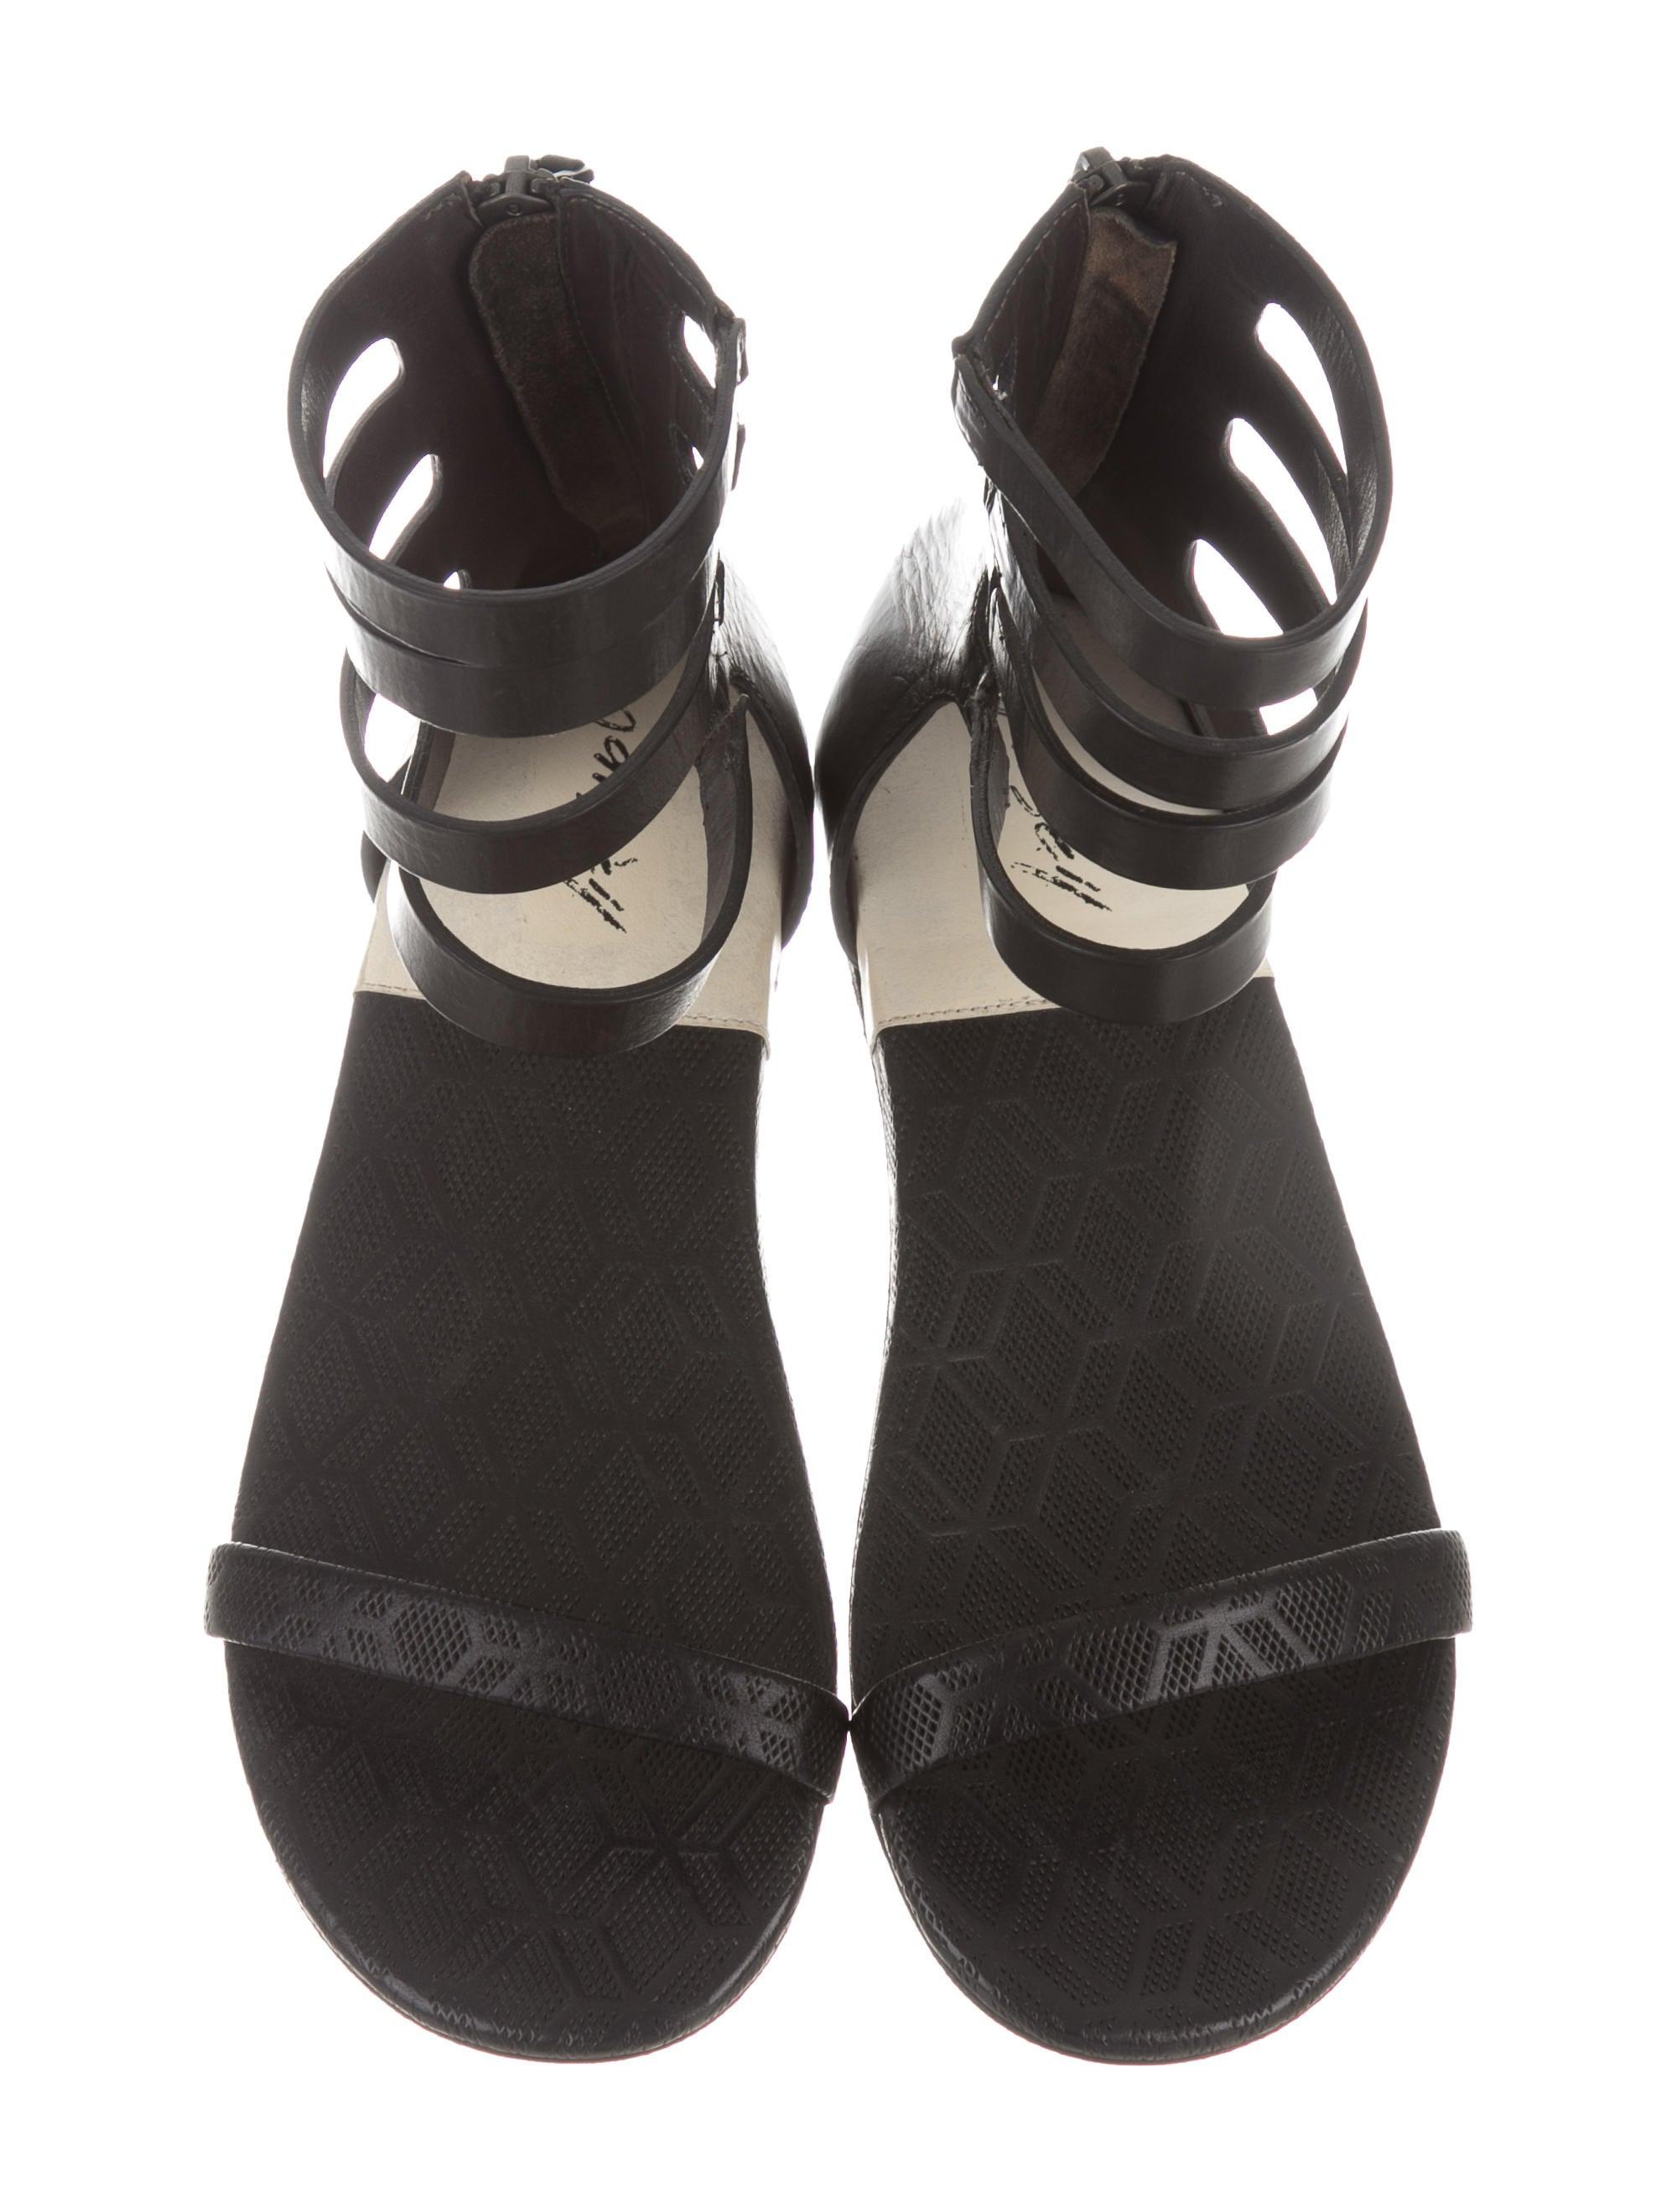 Marsèll Zeppela Gladiator Sandals cheap sale find great mXQFh